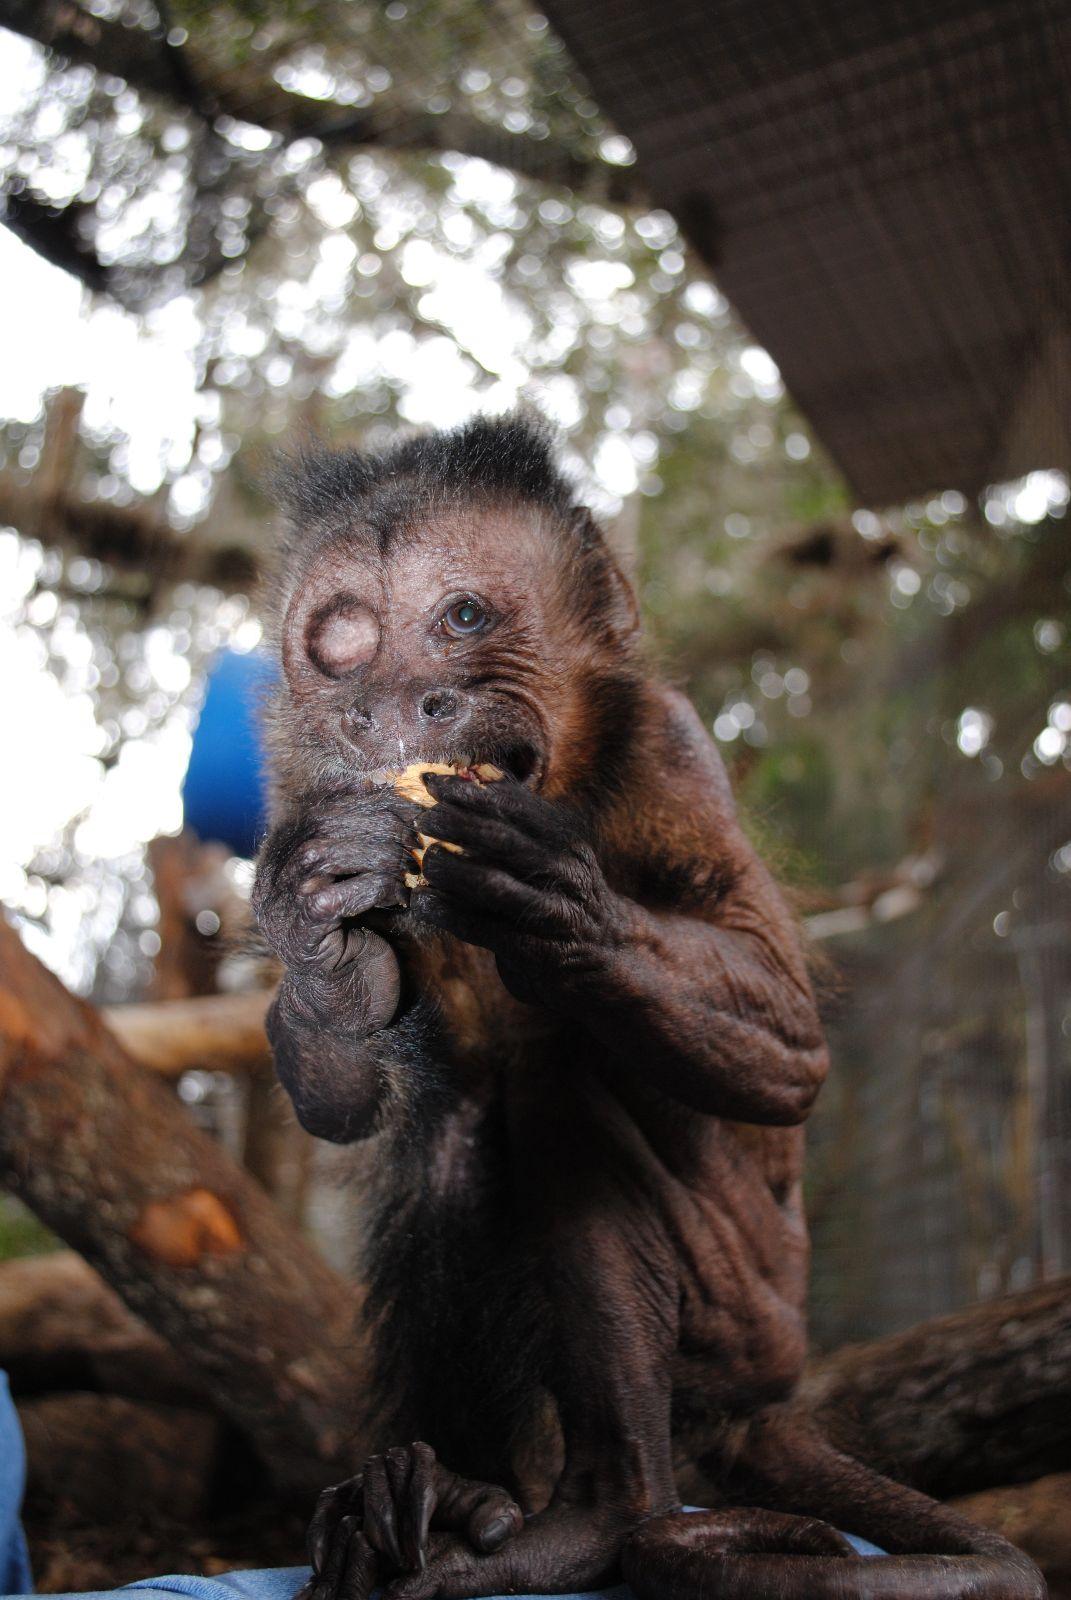 Jungle Friends Primate Sanctuary JN 2012 03 21 Money For